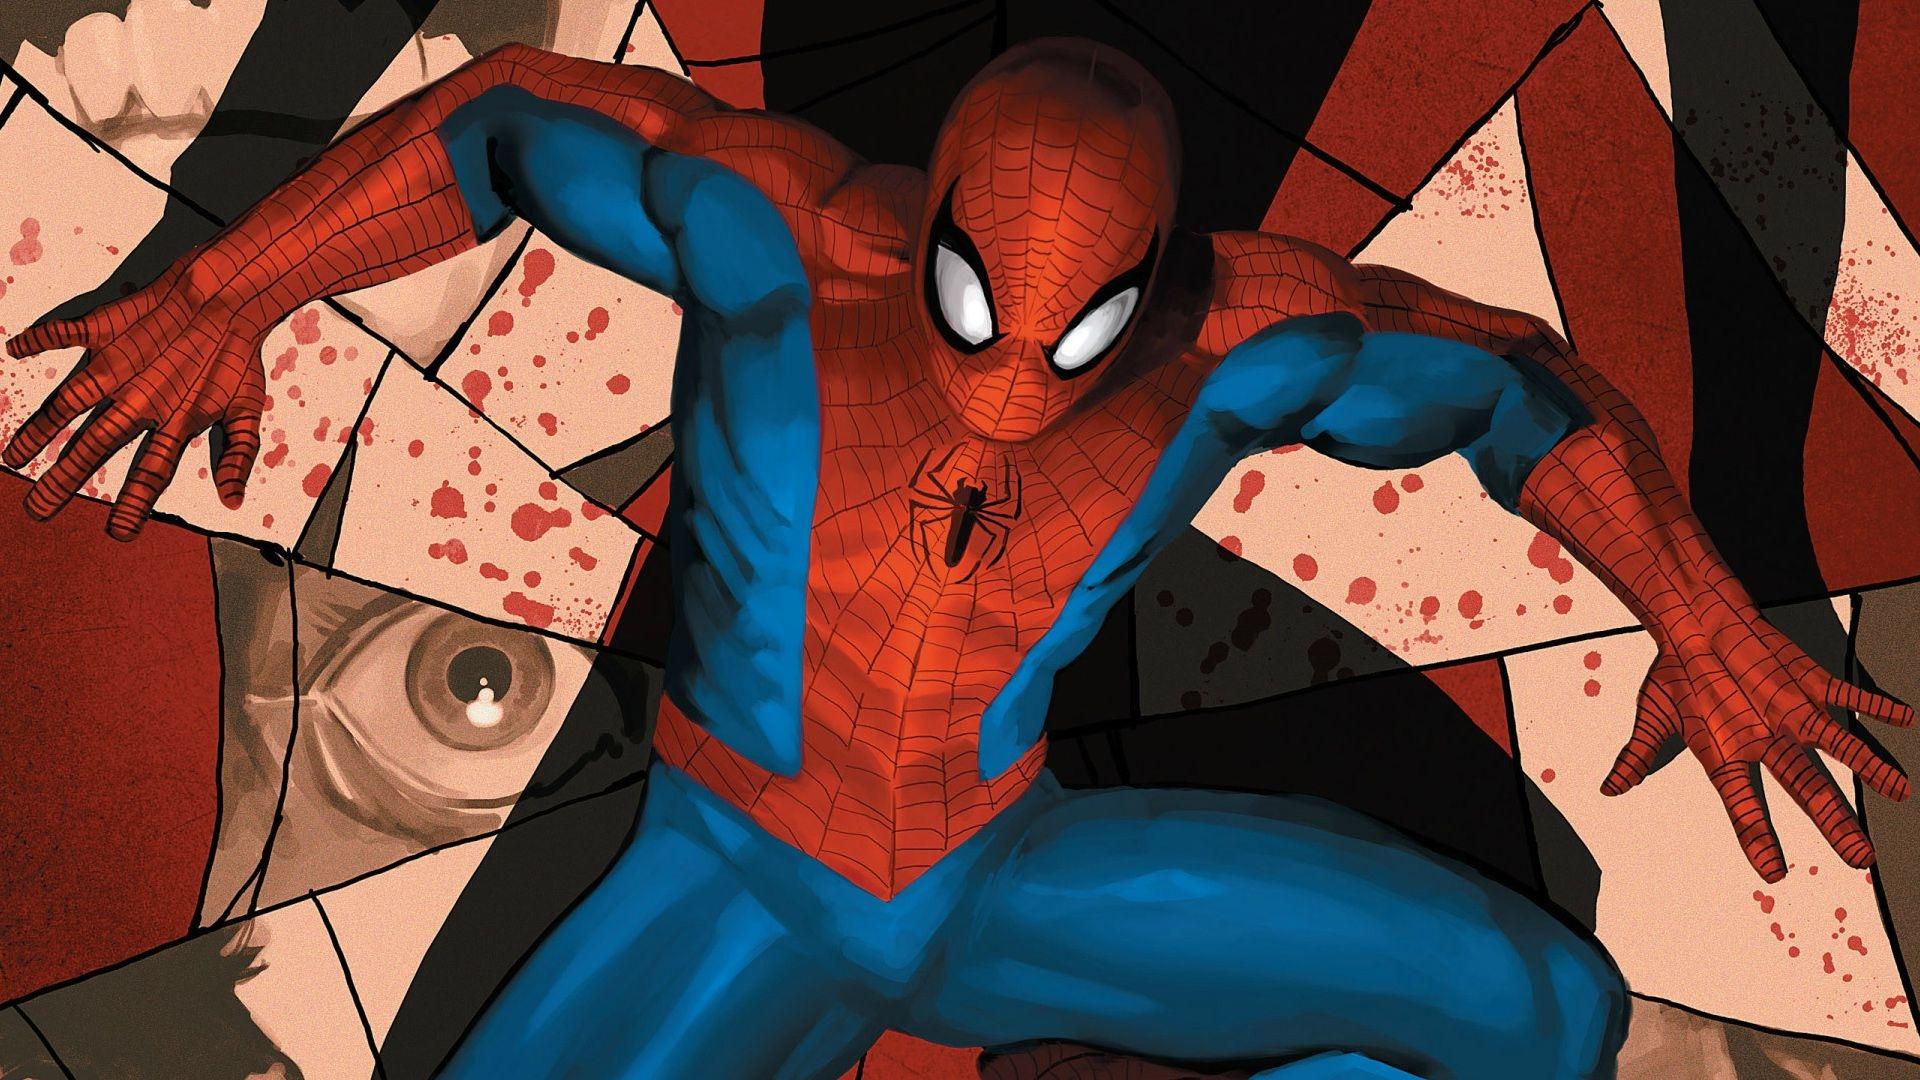 Fondos De Pantalla De Spiderman Wallpapers